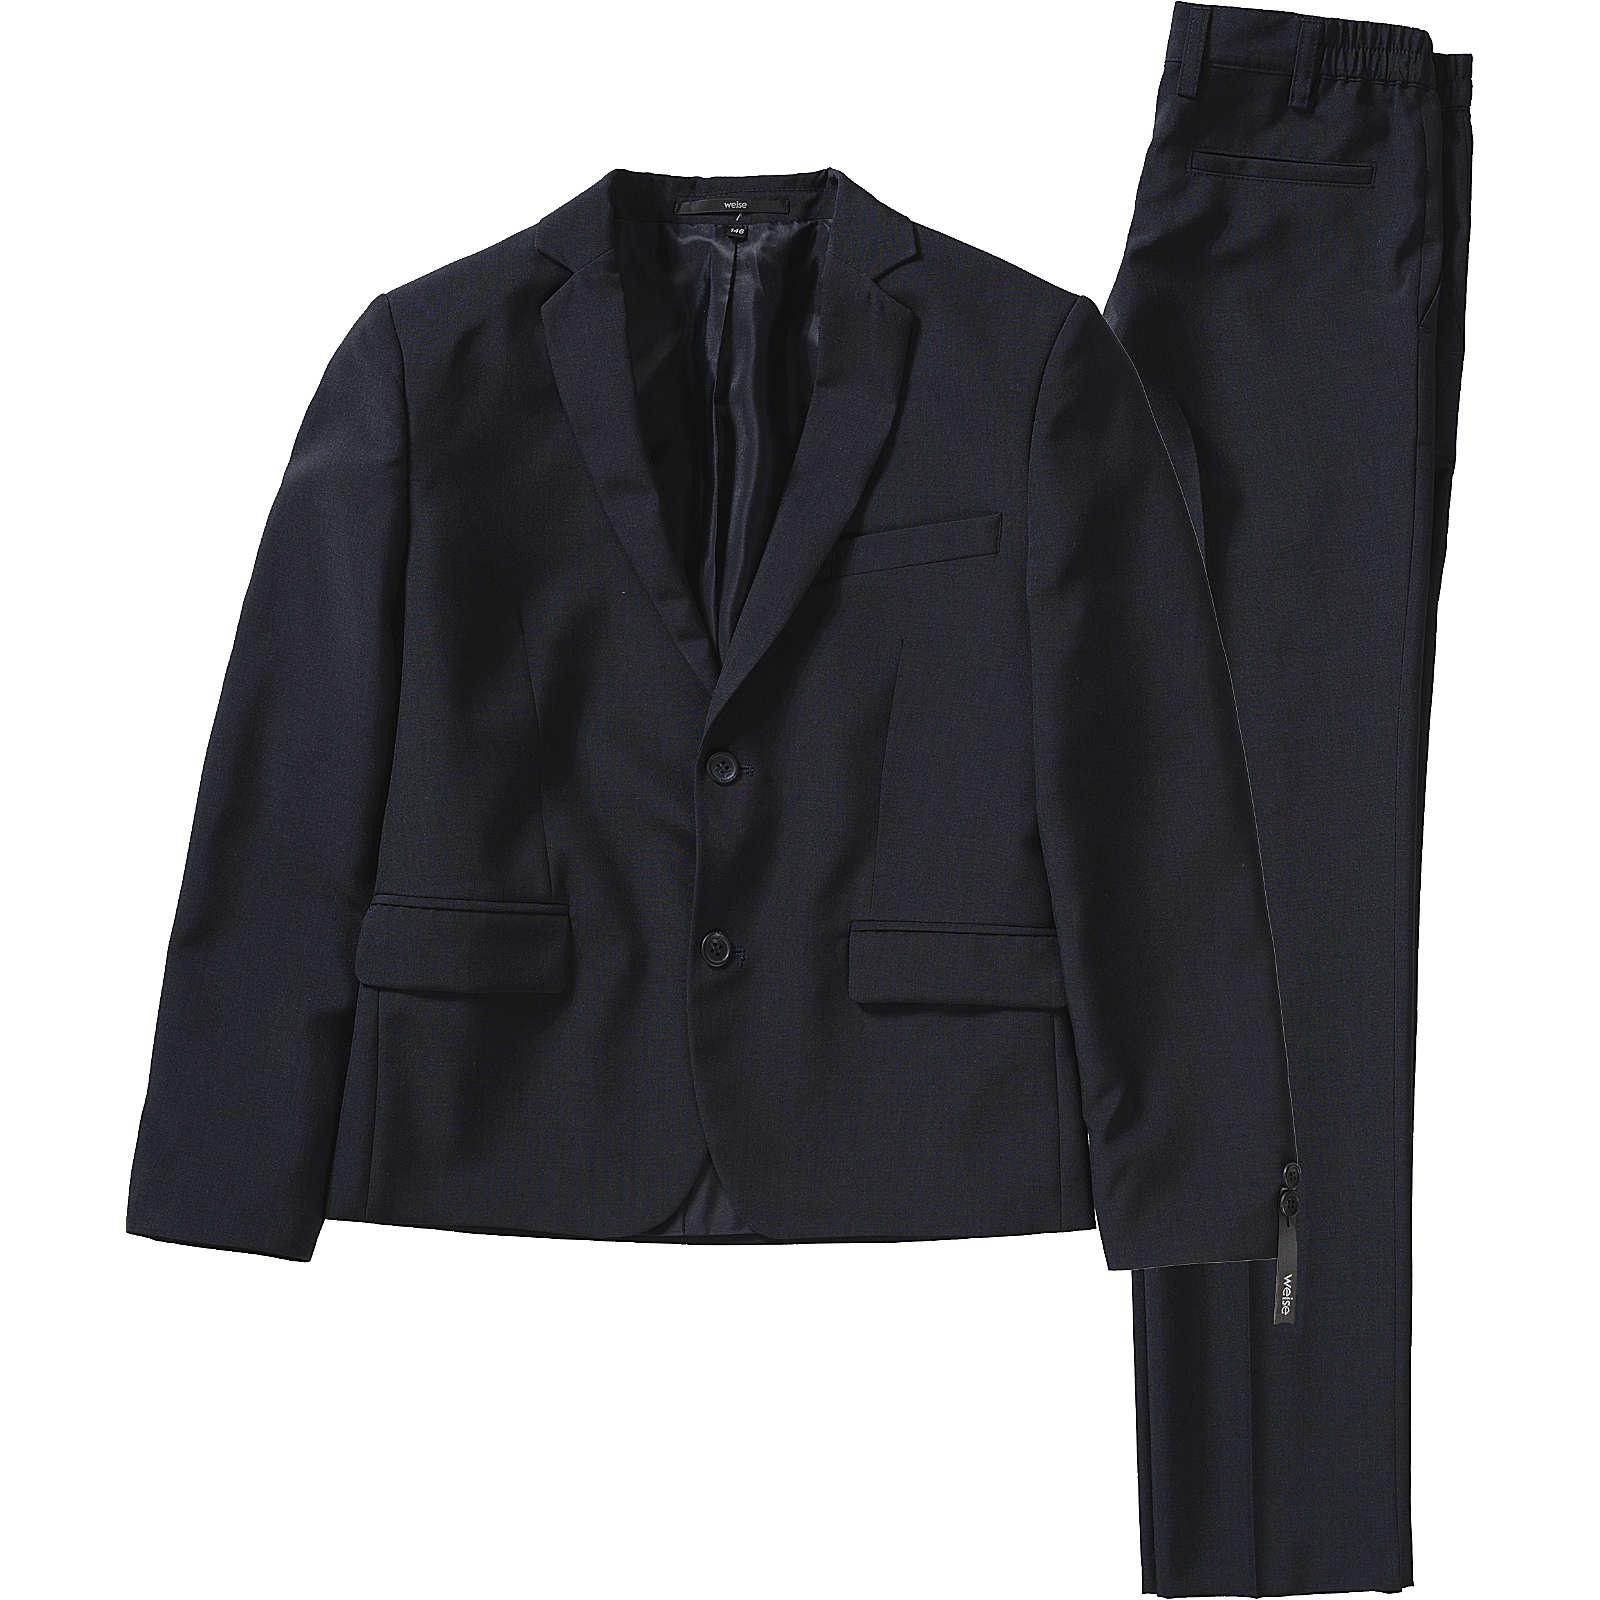 Weise Kinder Anzug, Slim Fit dunkelblau Junge Gr. 128